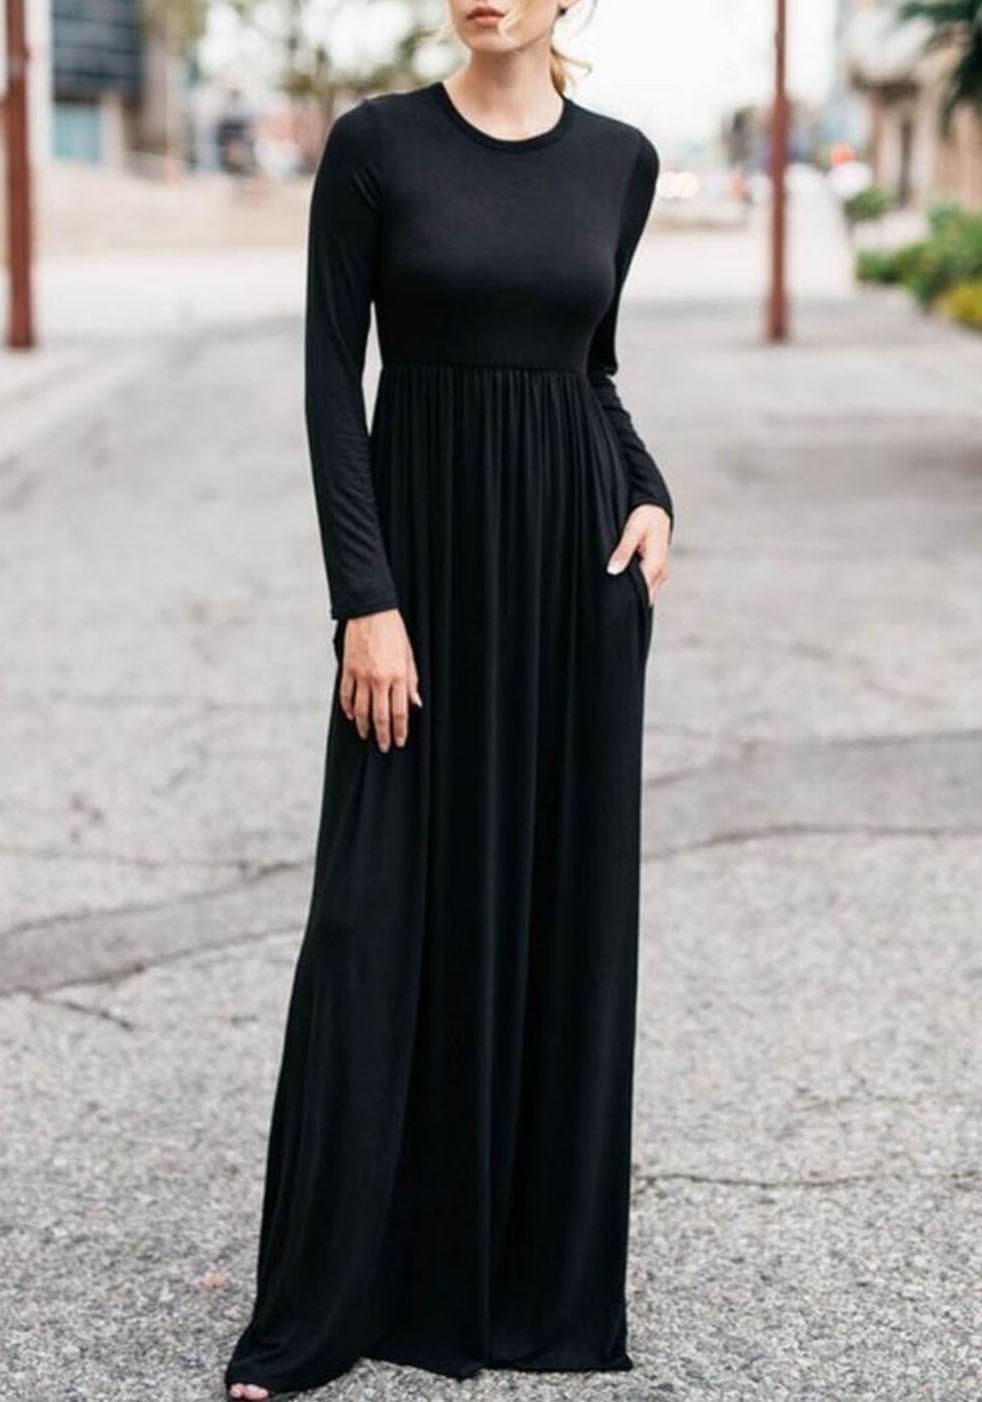 10 Elegant Abendkleider Lang Günstig VertriebFormal Einzigartig Abendkleider Lang Günstig Ärmel